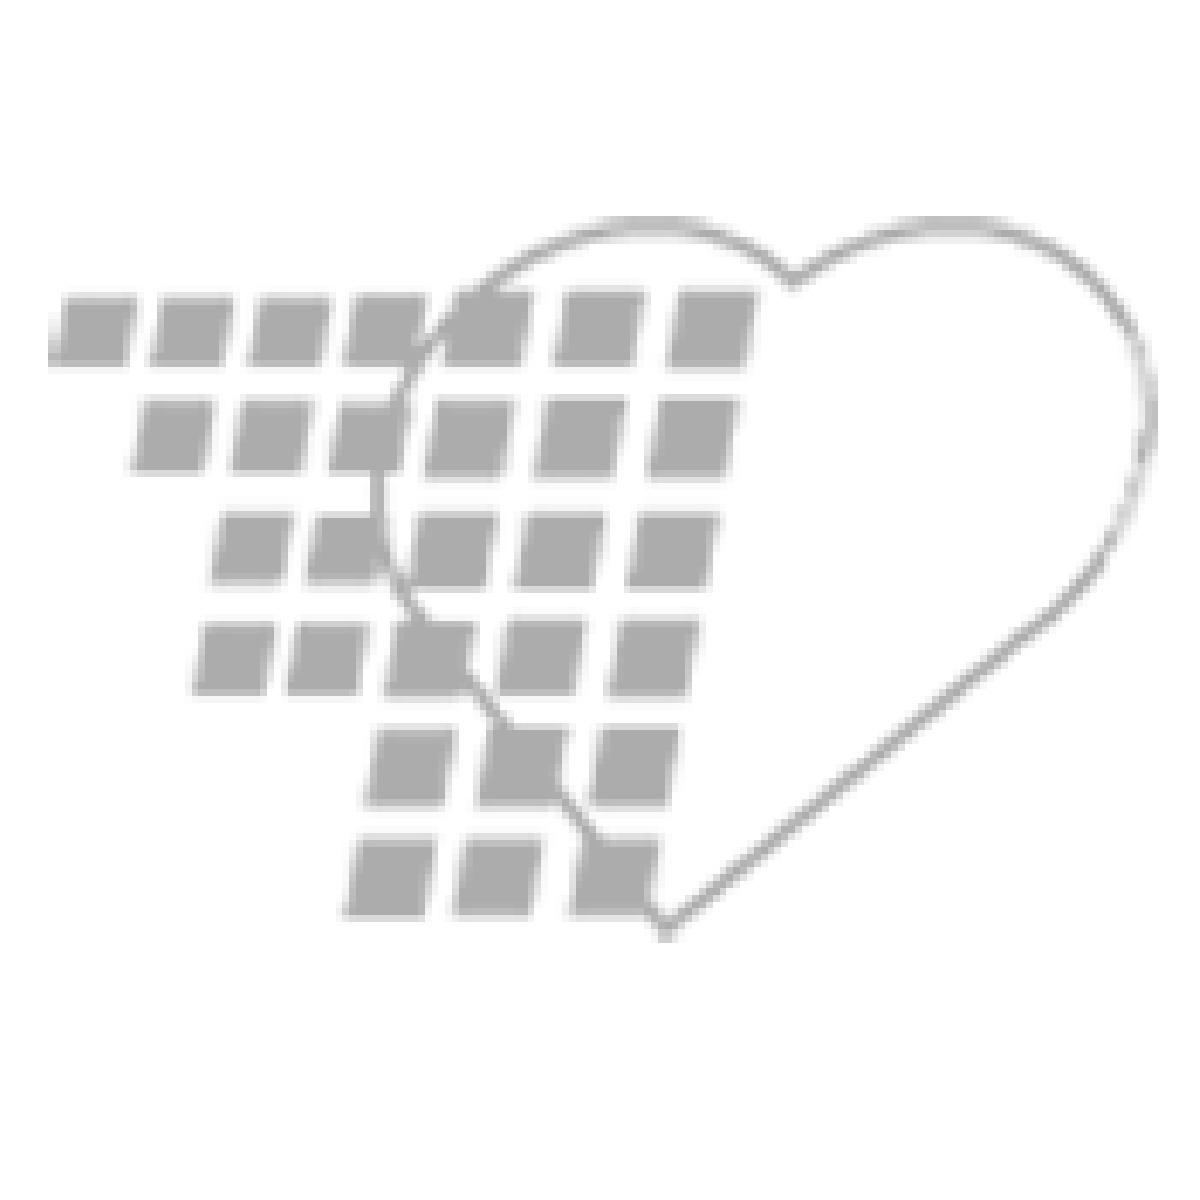 12-81-0013-BRN - SimObesitySuit   Jr - Brown